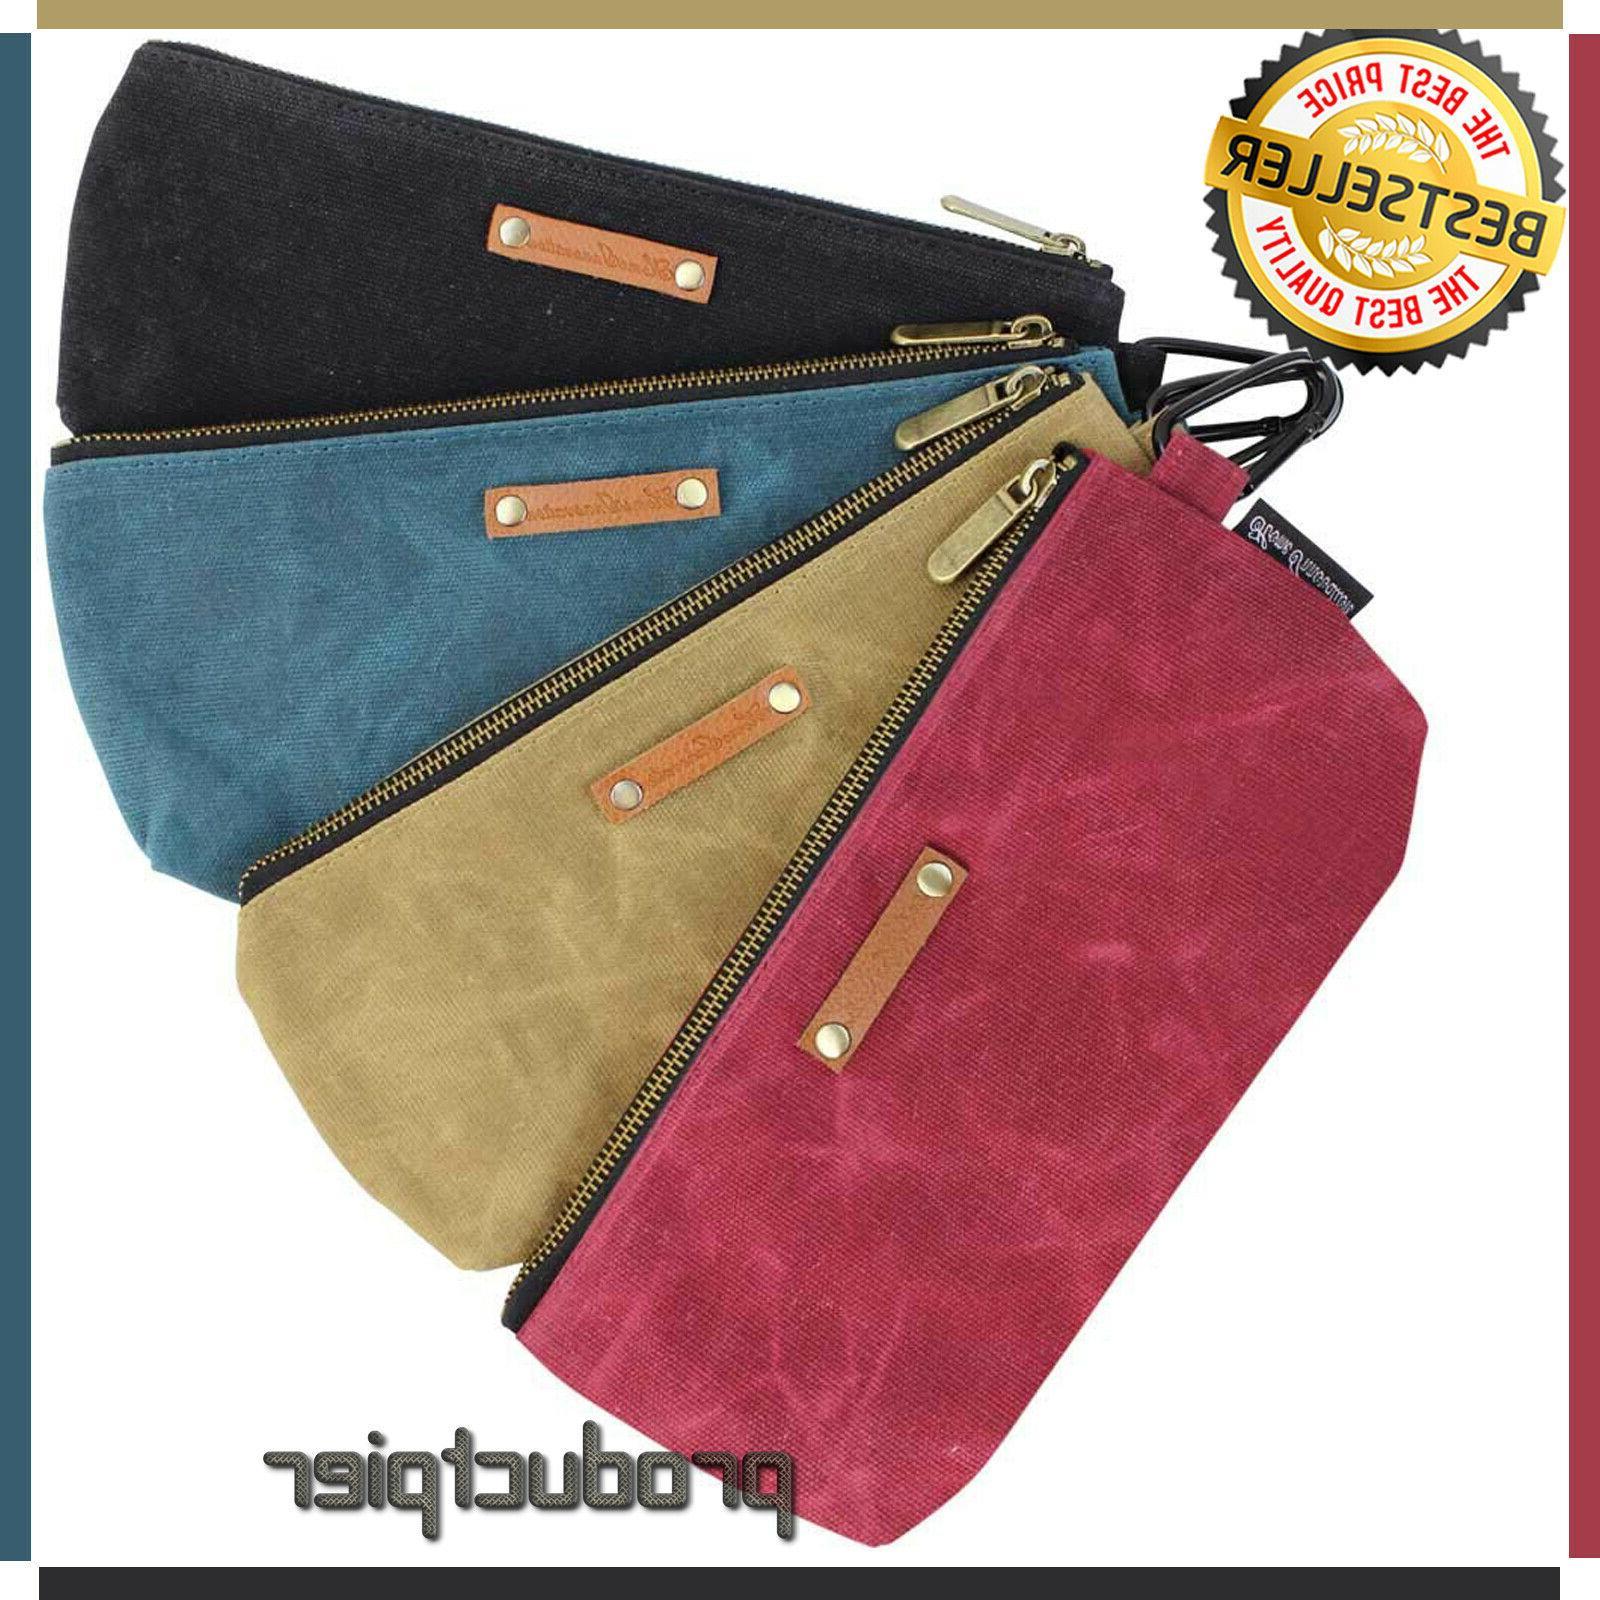 4 zipper pouch tool bags waxed canvas